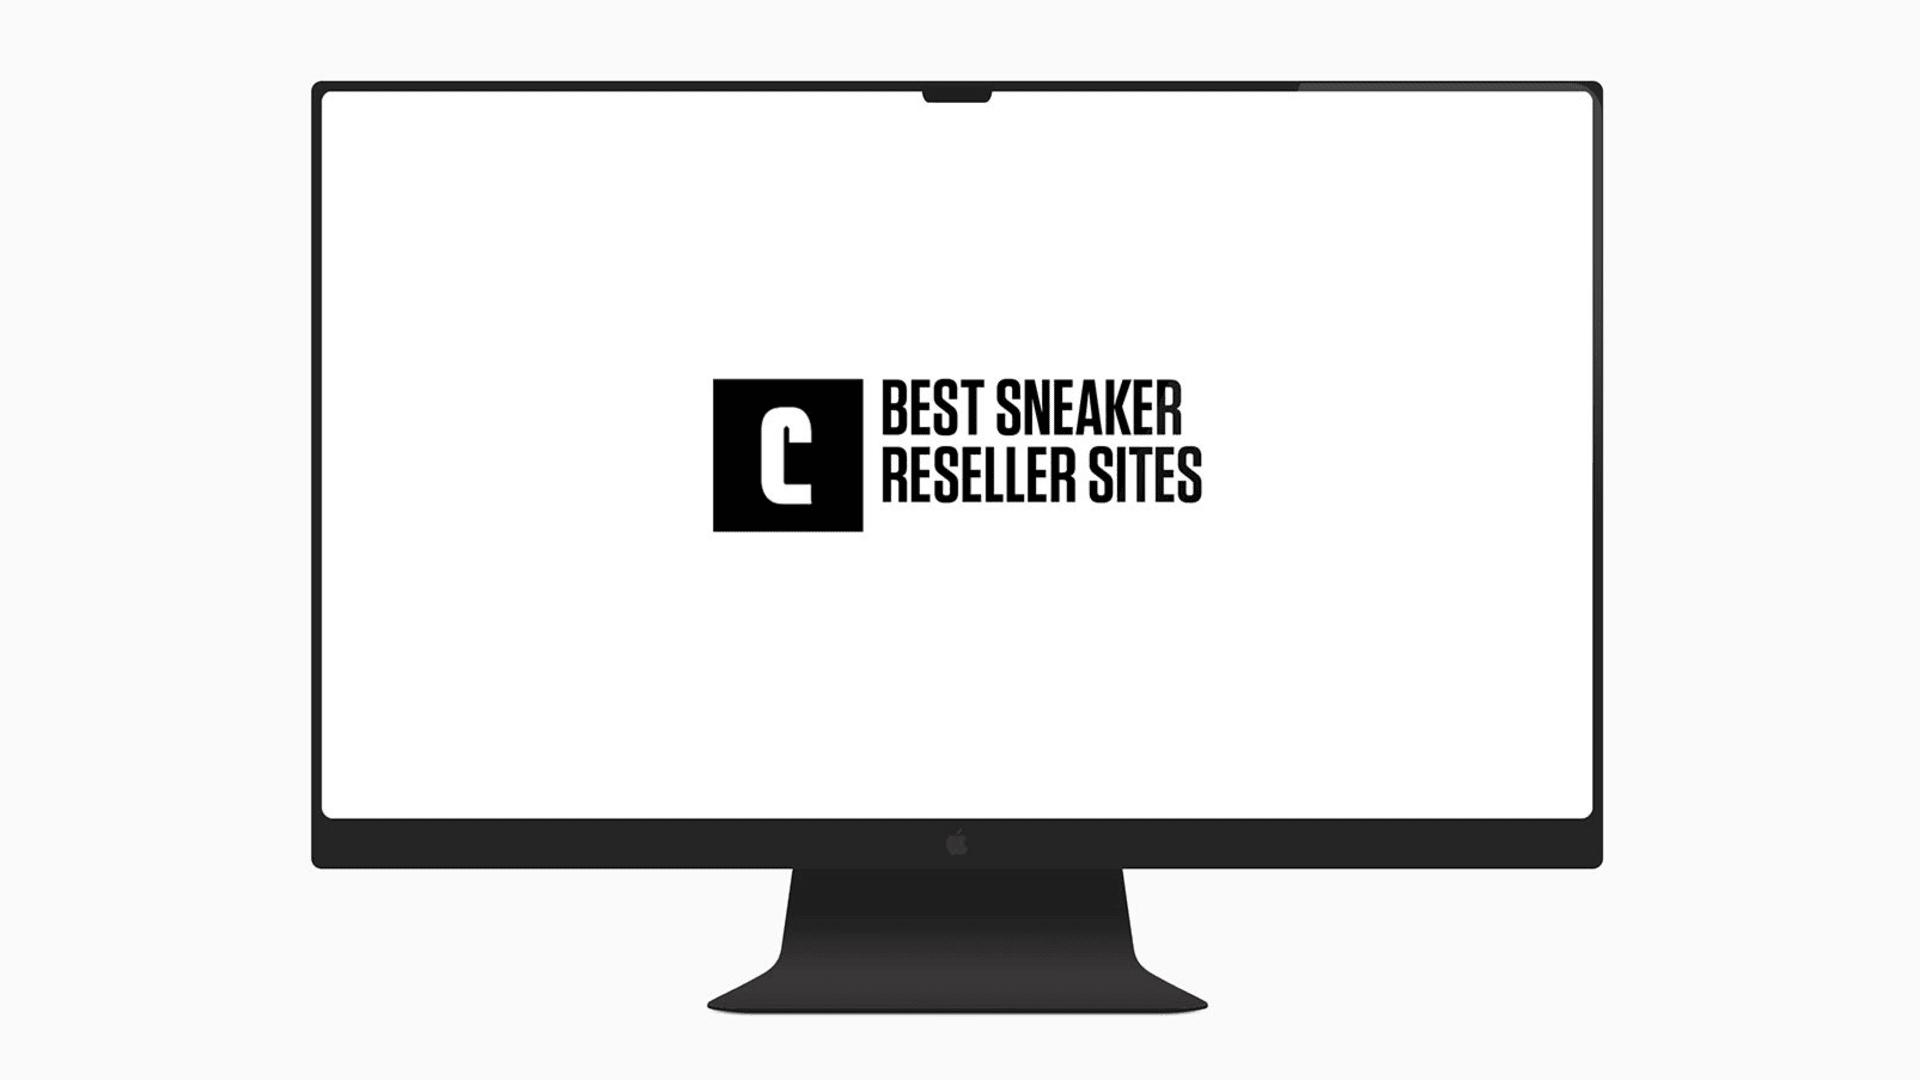 Complex Sneakers Best Sneaker Reseller Sites